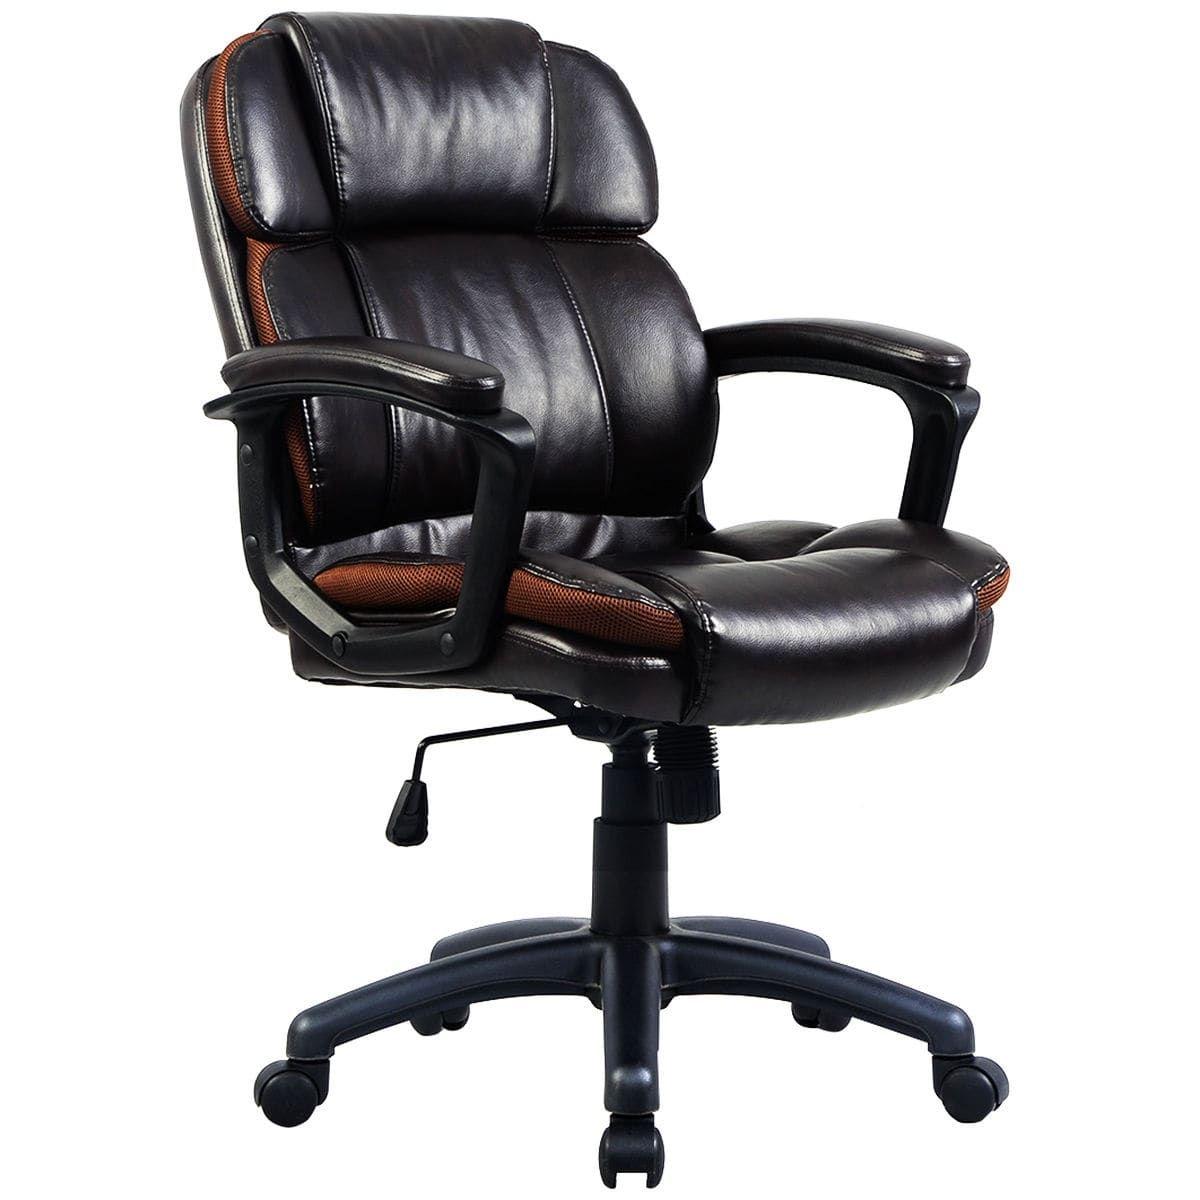 Costway ergonomic pu leather midback executive computer desk task